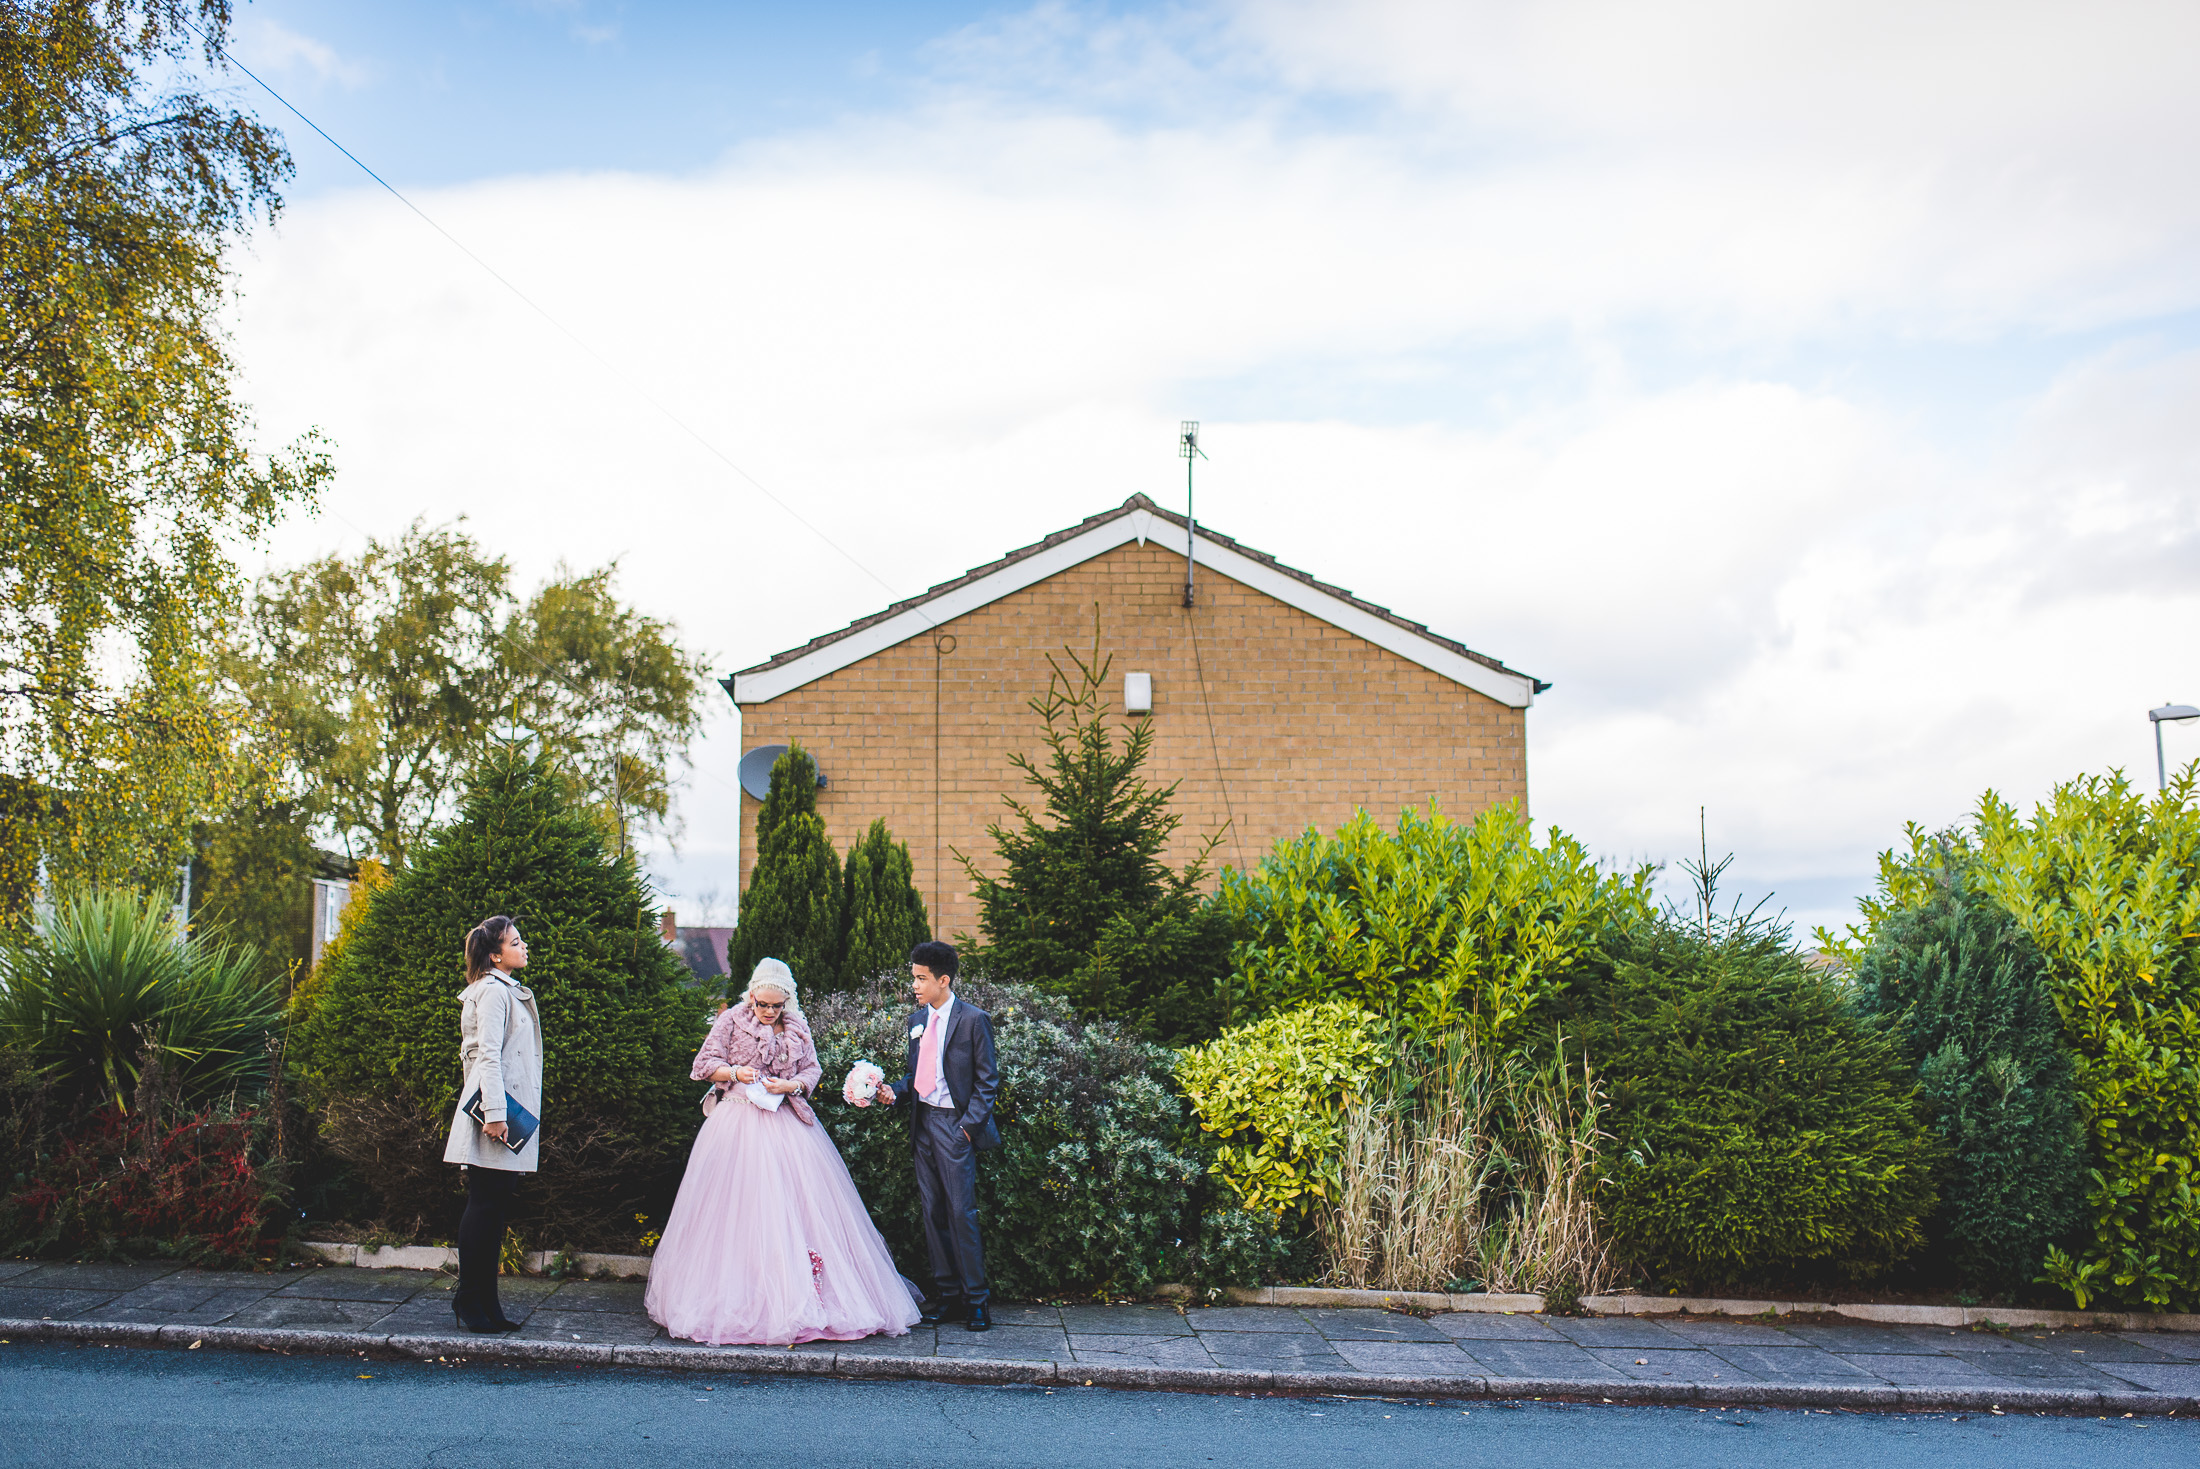 00019 Bride Groom Wedding Photography Staffordshire.jpg